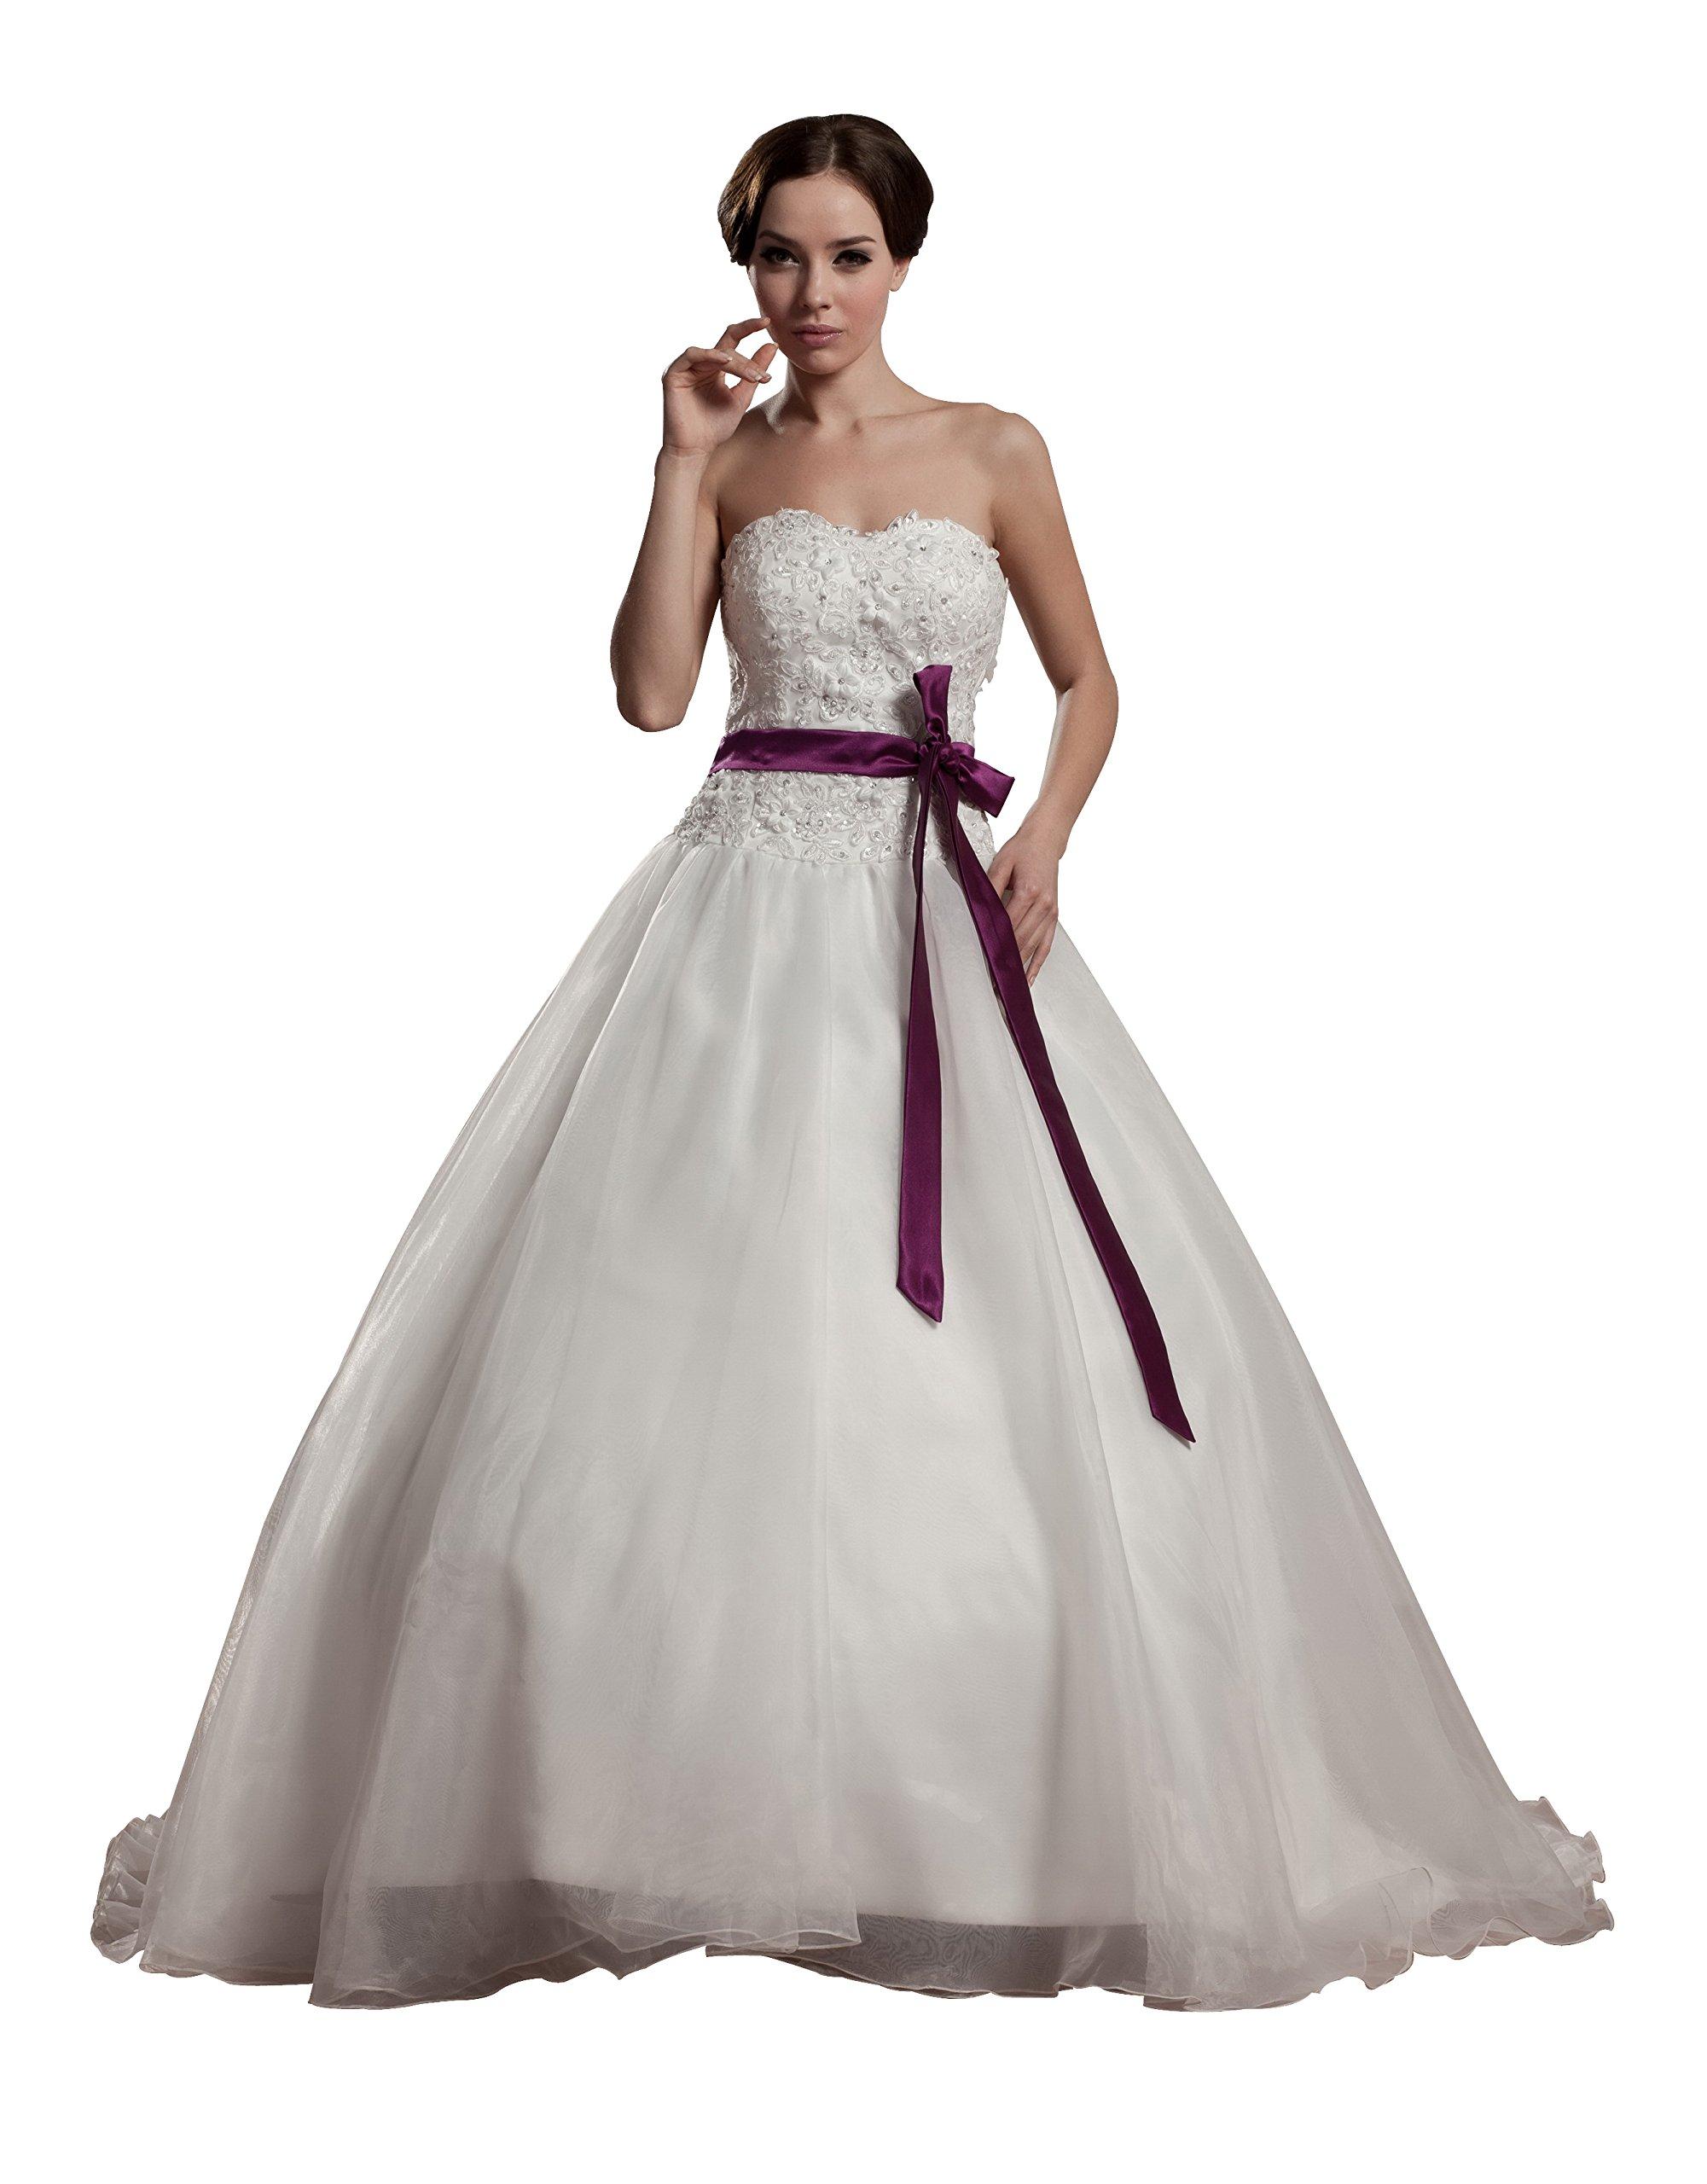 Vogue007 Womens Sweetheart Satin Taffeta Wedding Dress with Floral, White, 18